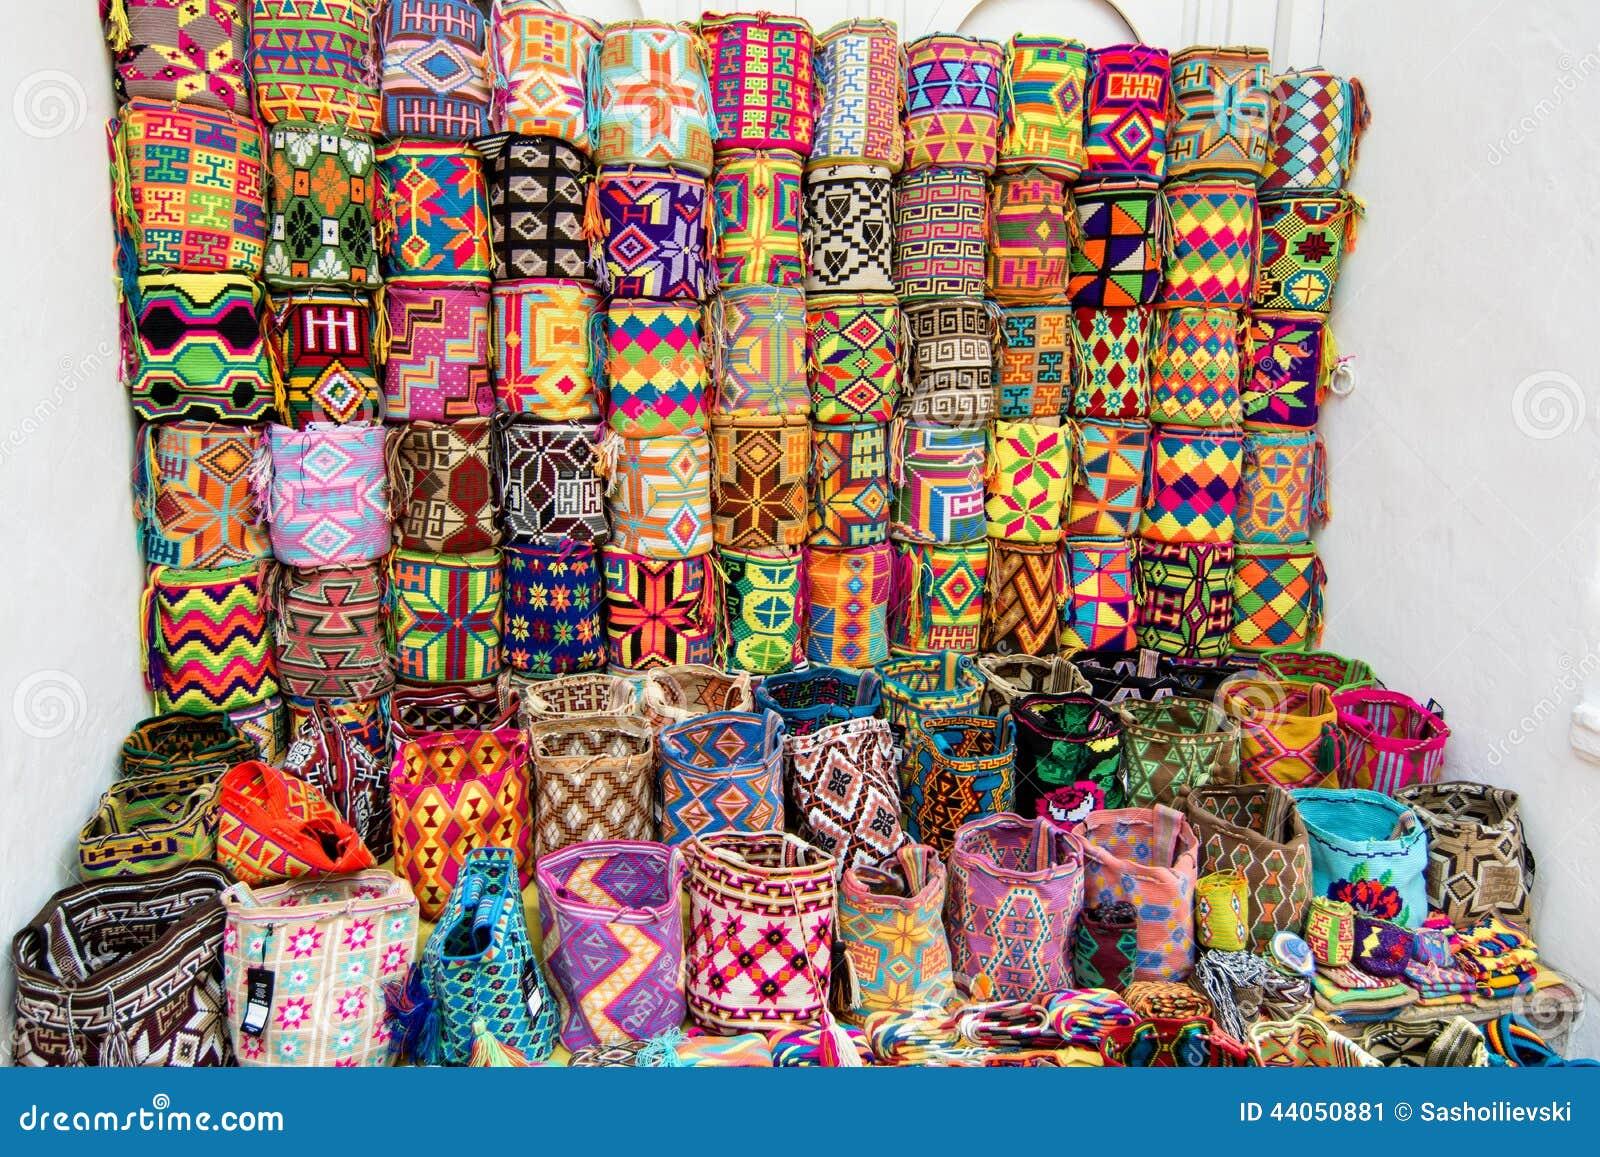 borse colombiane